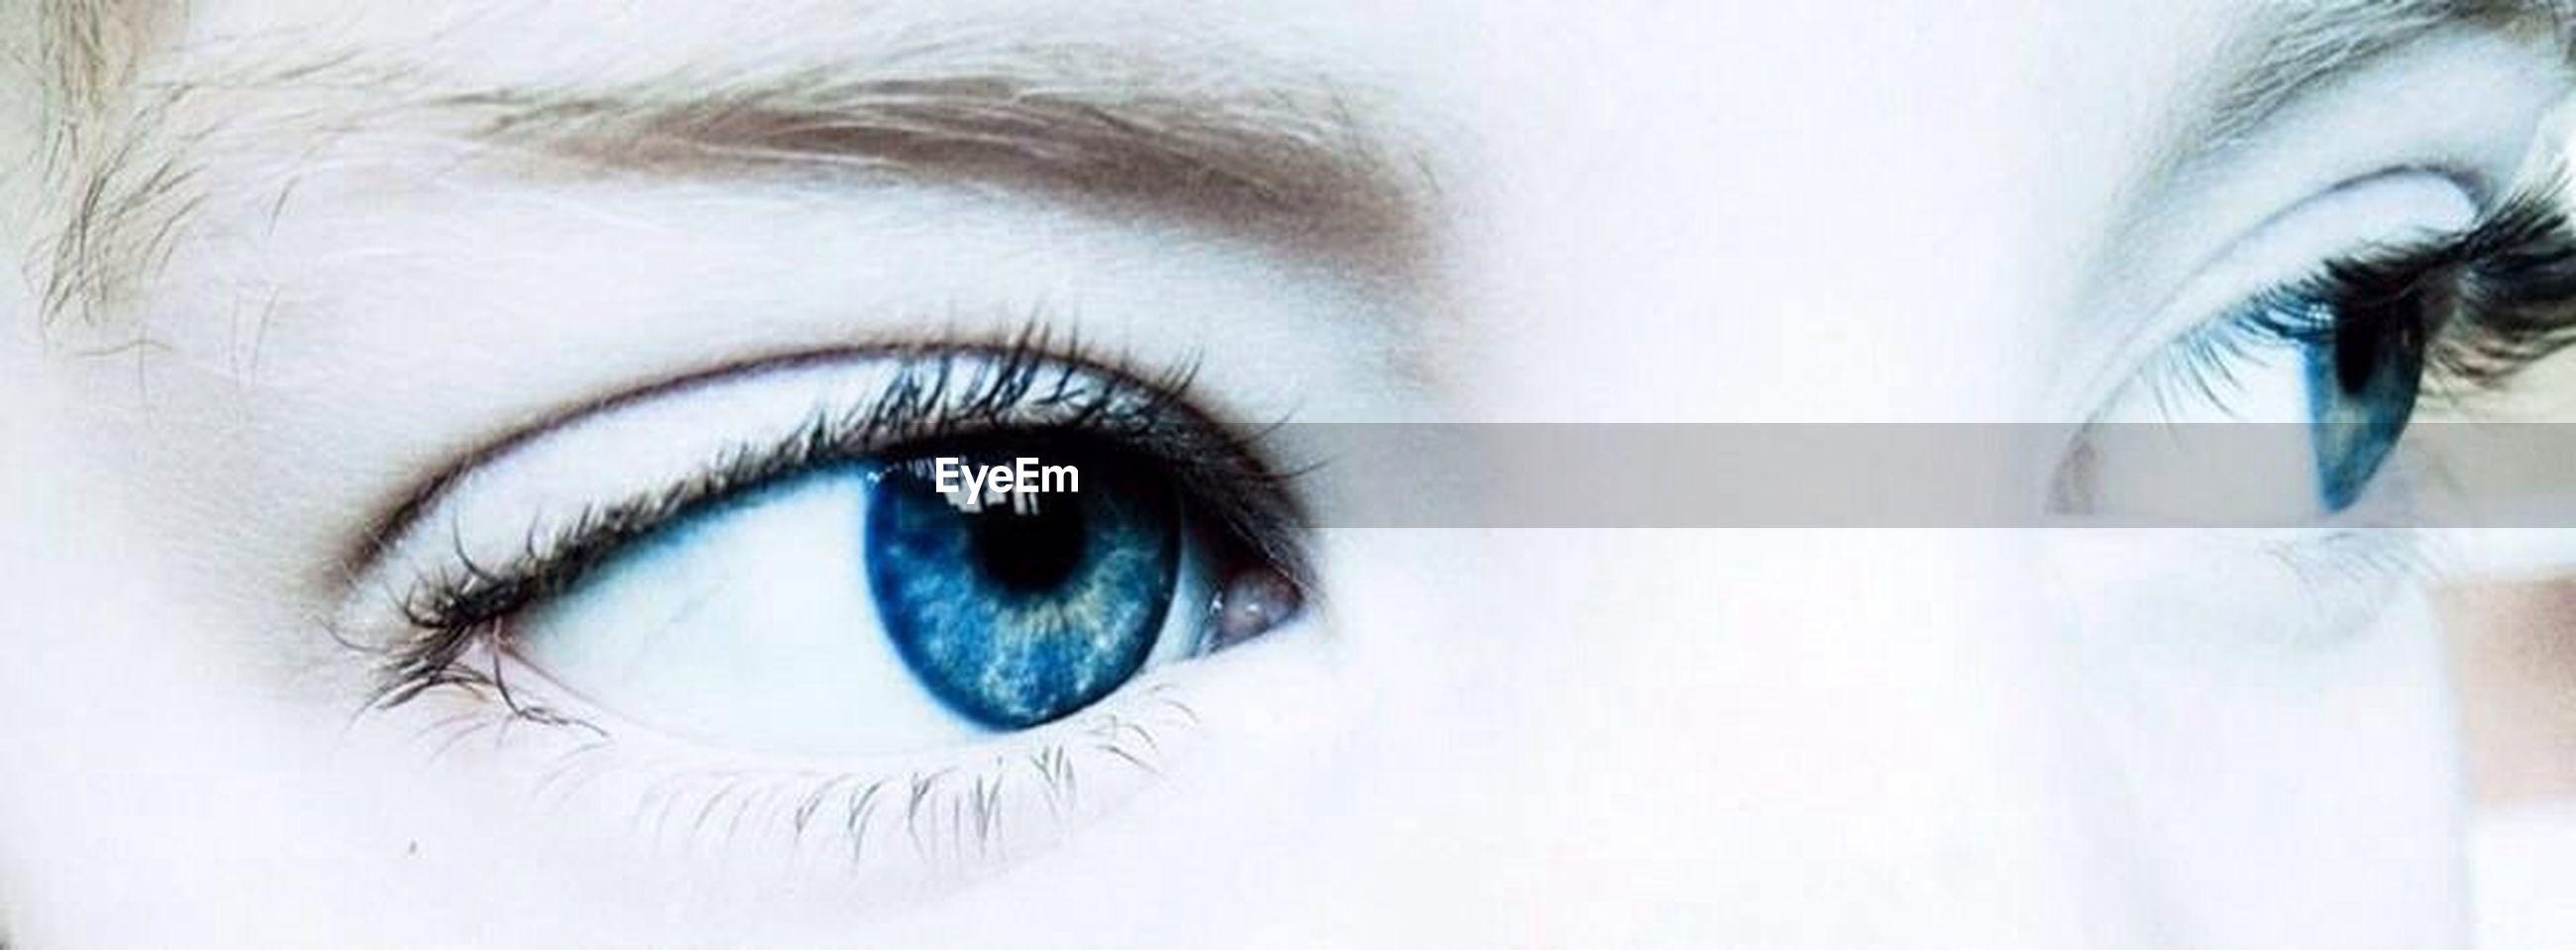 human eye, eyelash, looking at camera, close-up, eyesight, portrait, sensory perception, eyeball, human face, iris - eye, headshot, part of, lifestyles, extreme close-up, human skin, eyebrow, indoors